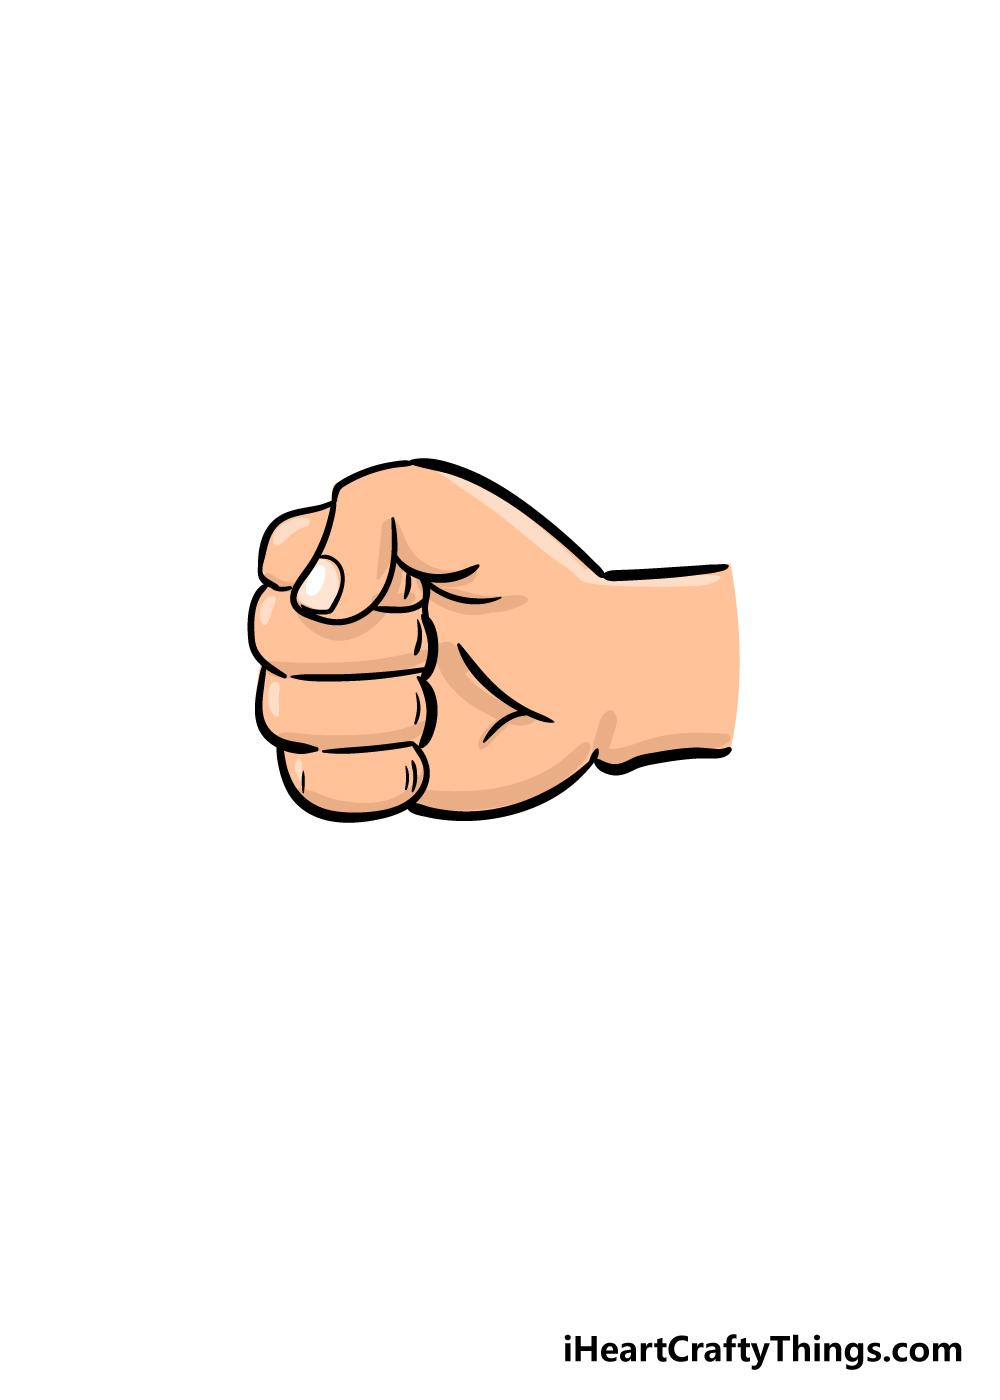 fist drawing step 6